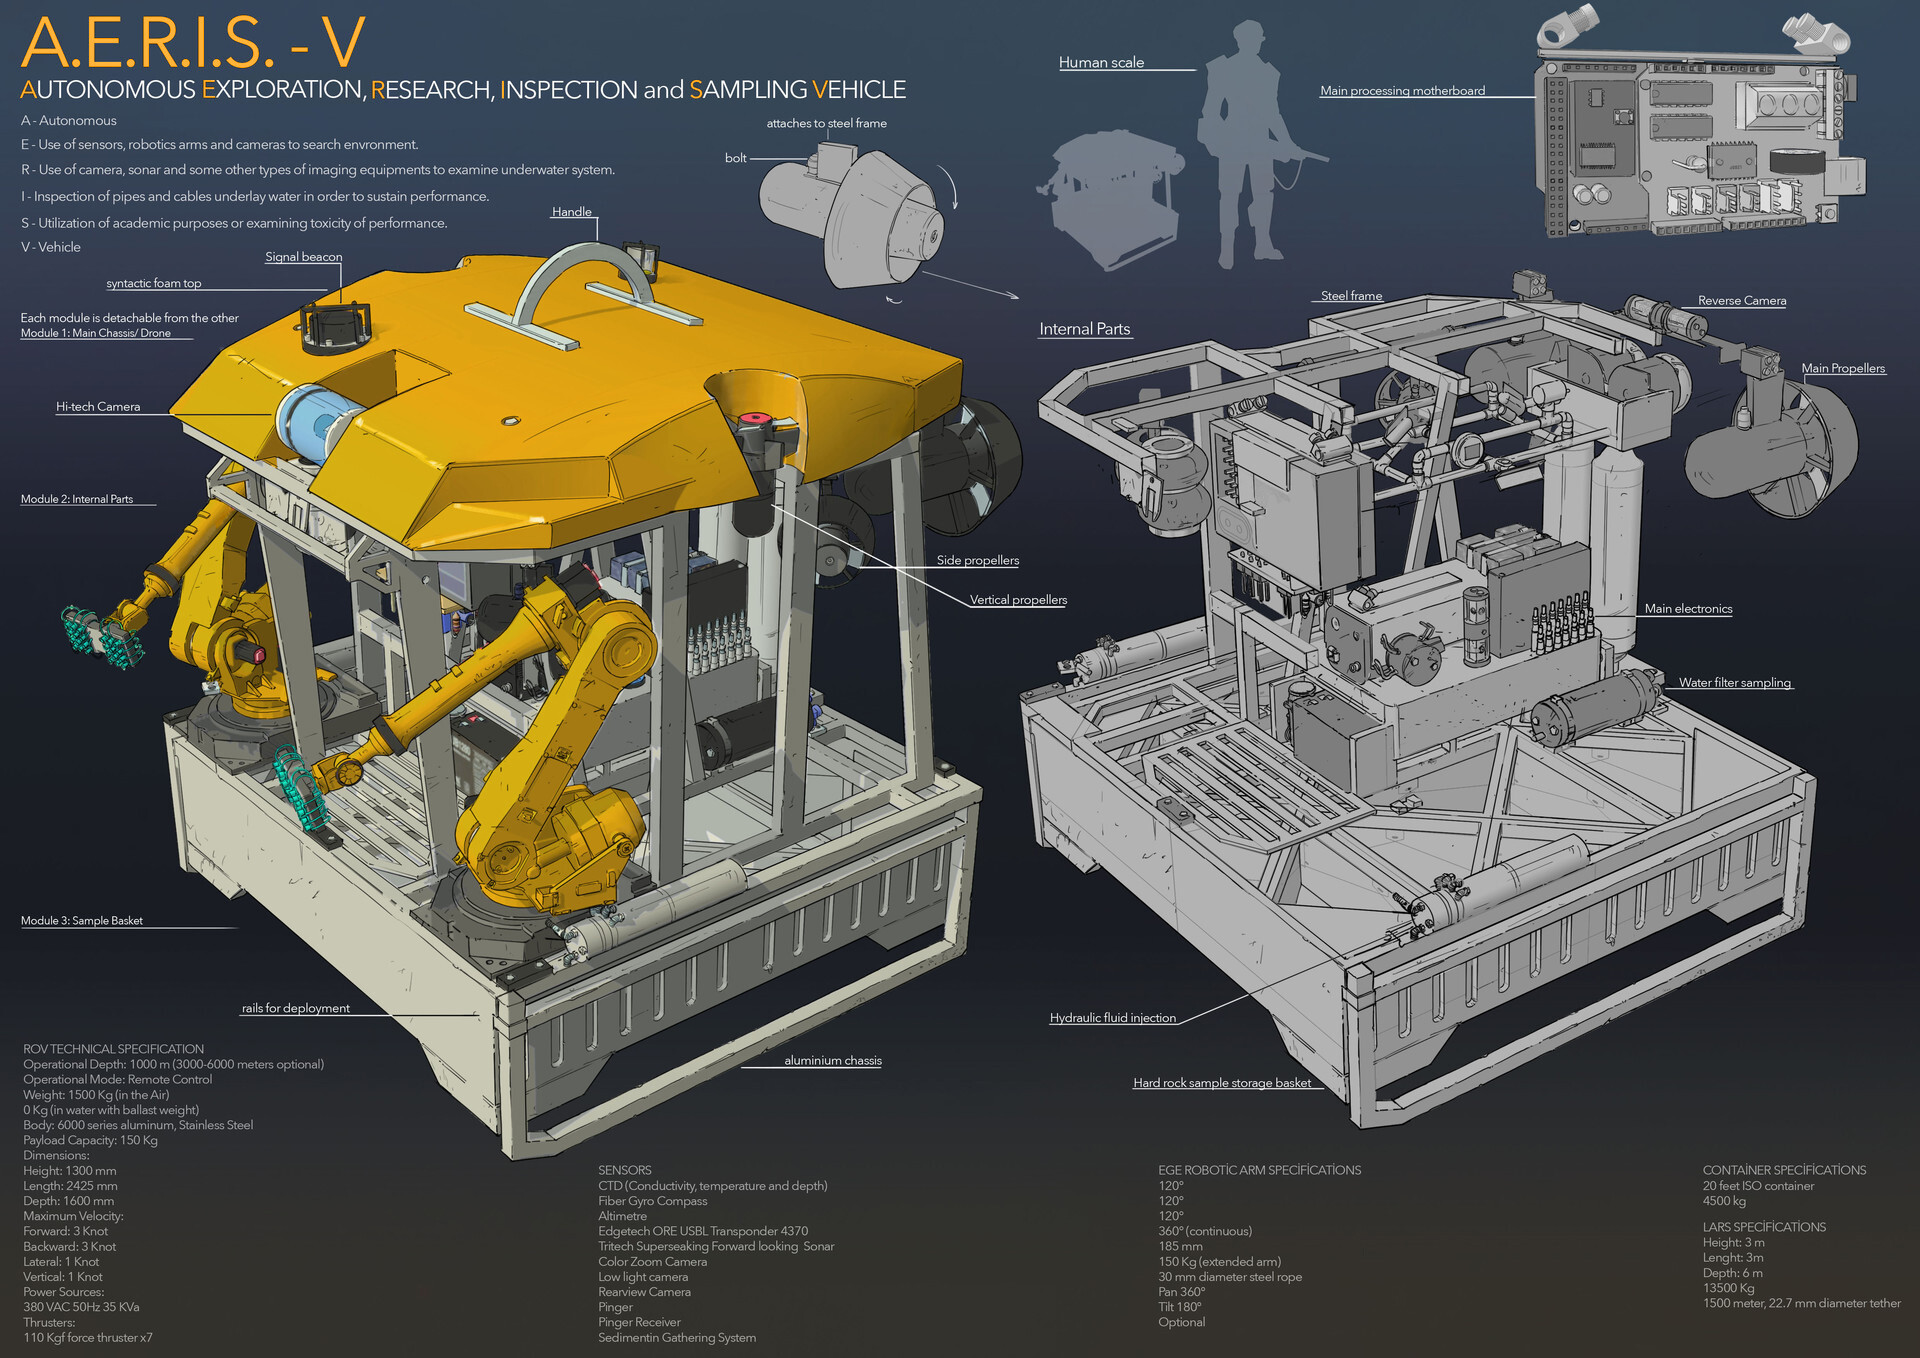 Philip v philip v design assembly week09 philip varbanov 03